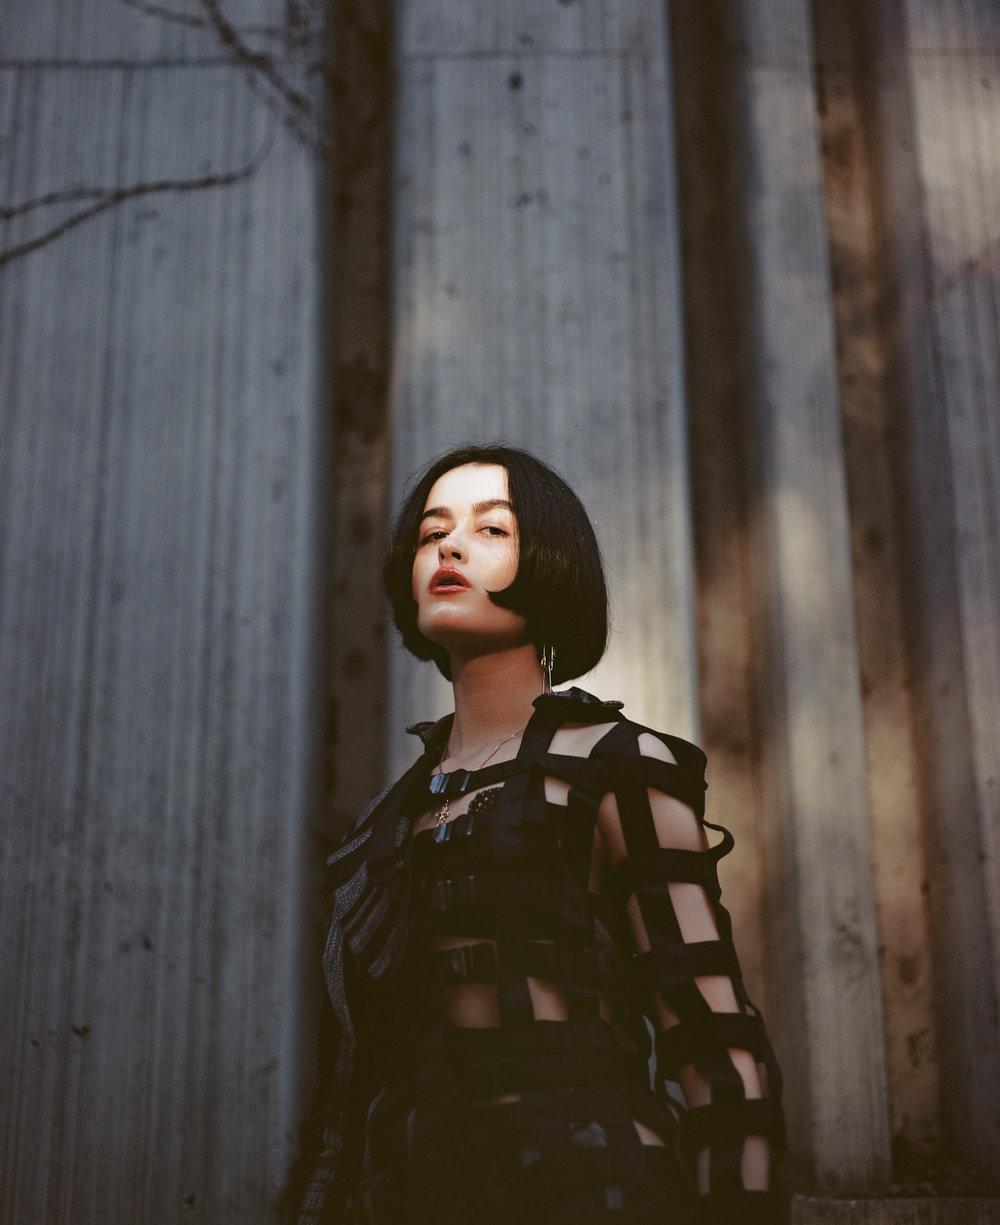 Photographer: Wilder Mathias  Designer: Hannah Eriksson  Model: Veronika Yemelyánova